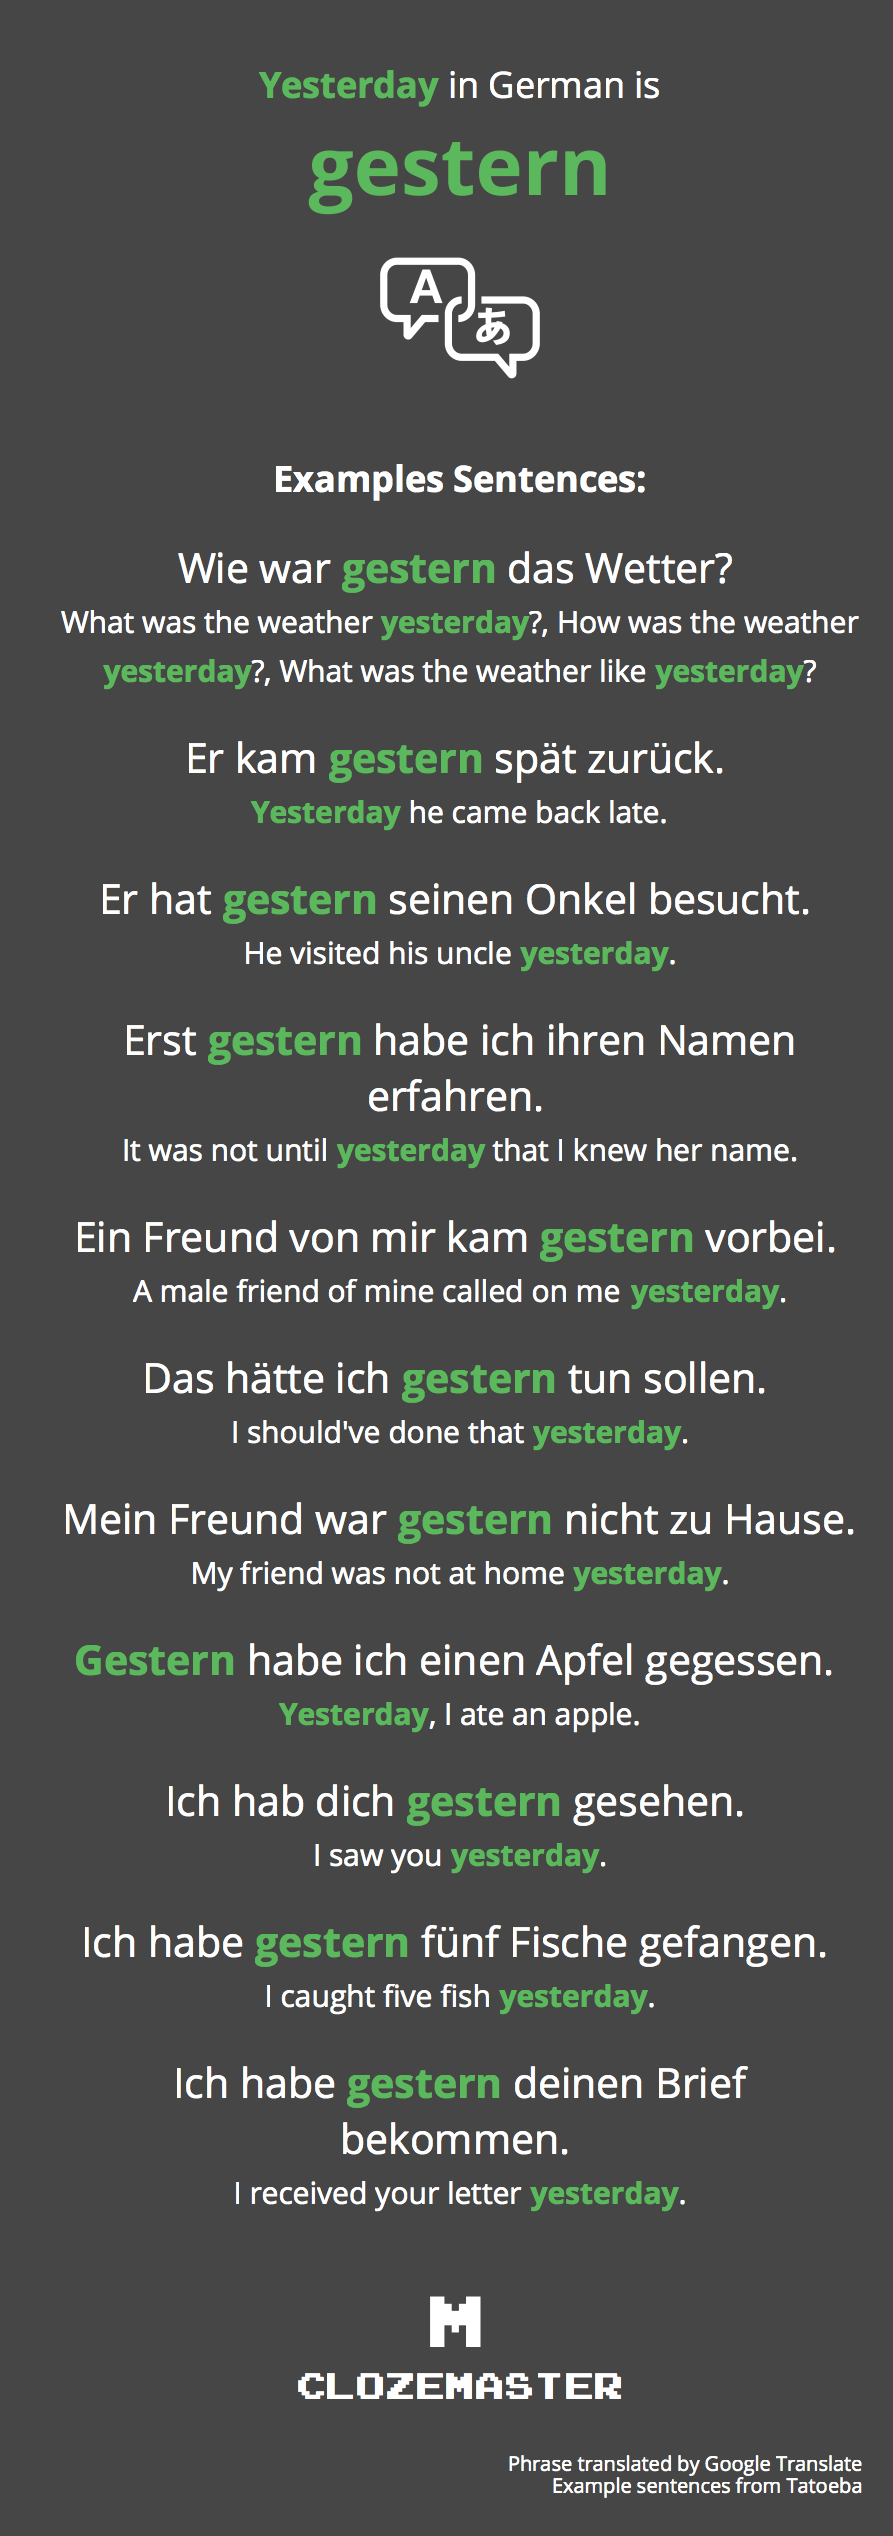 Yesterday In German